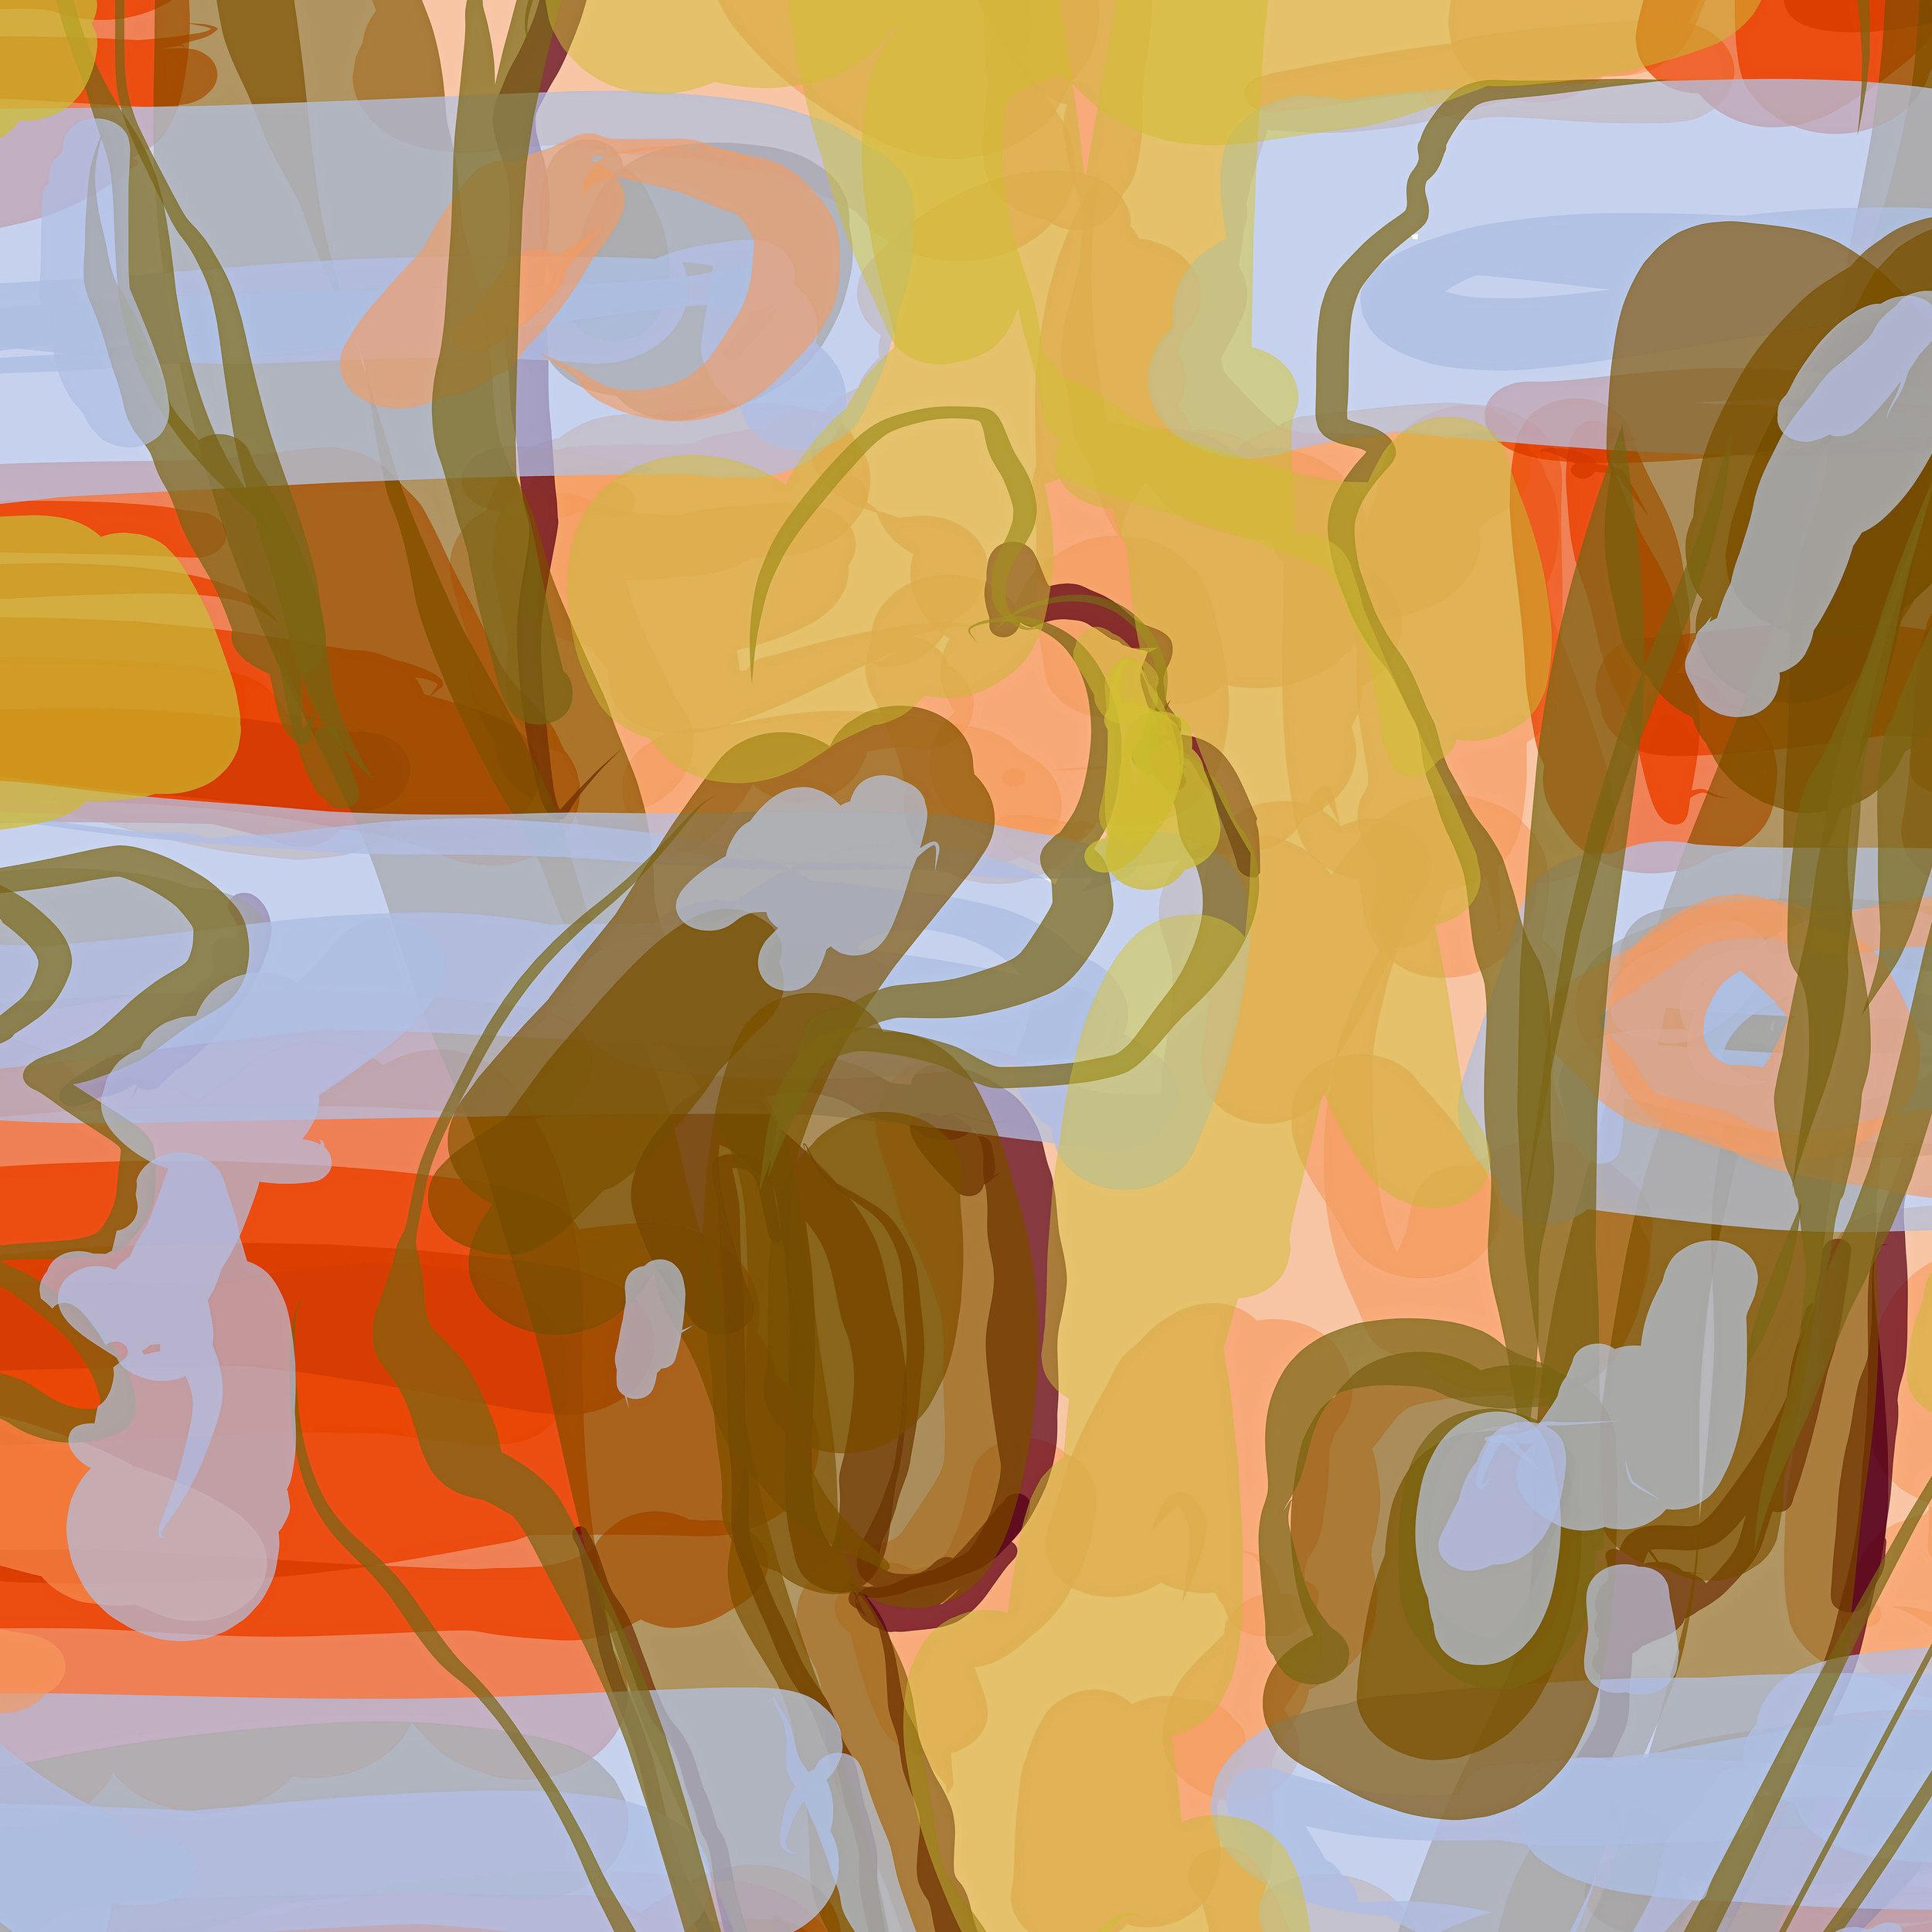 11may19 ipad image1 abstract_stream-vdetail1alt1lrgmed.jpg